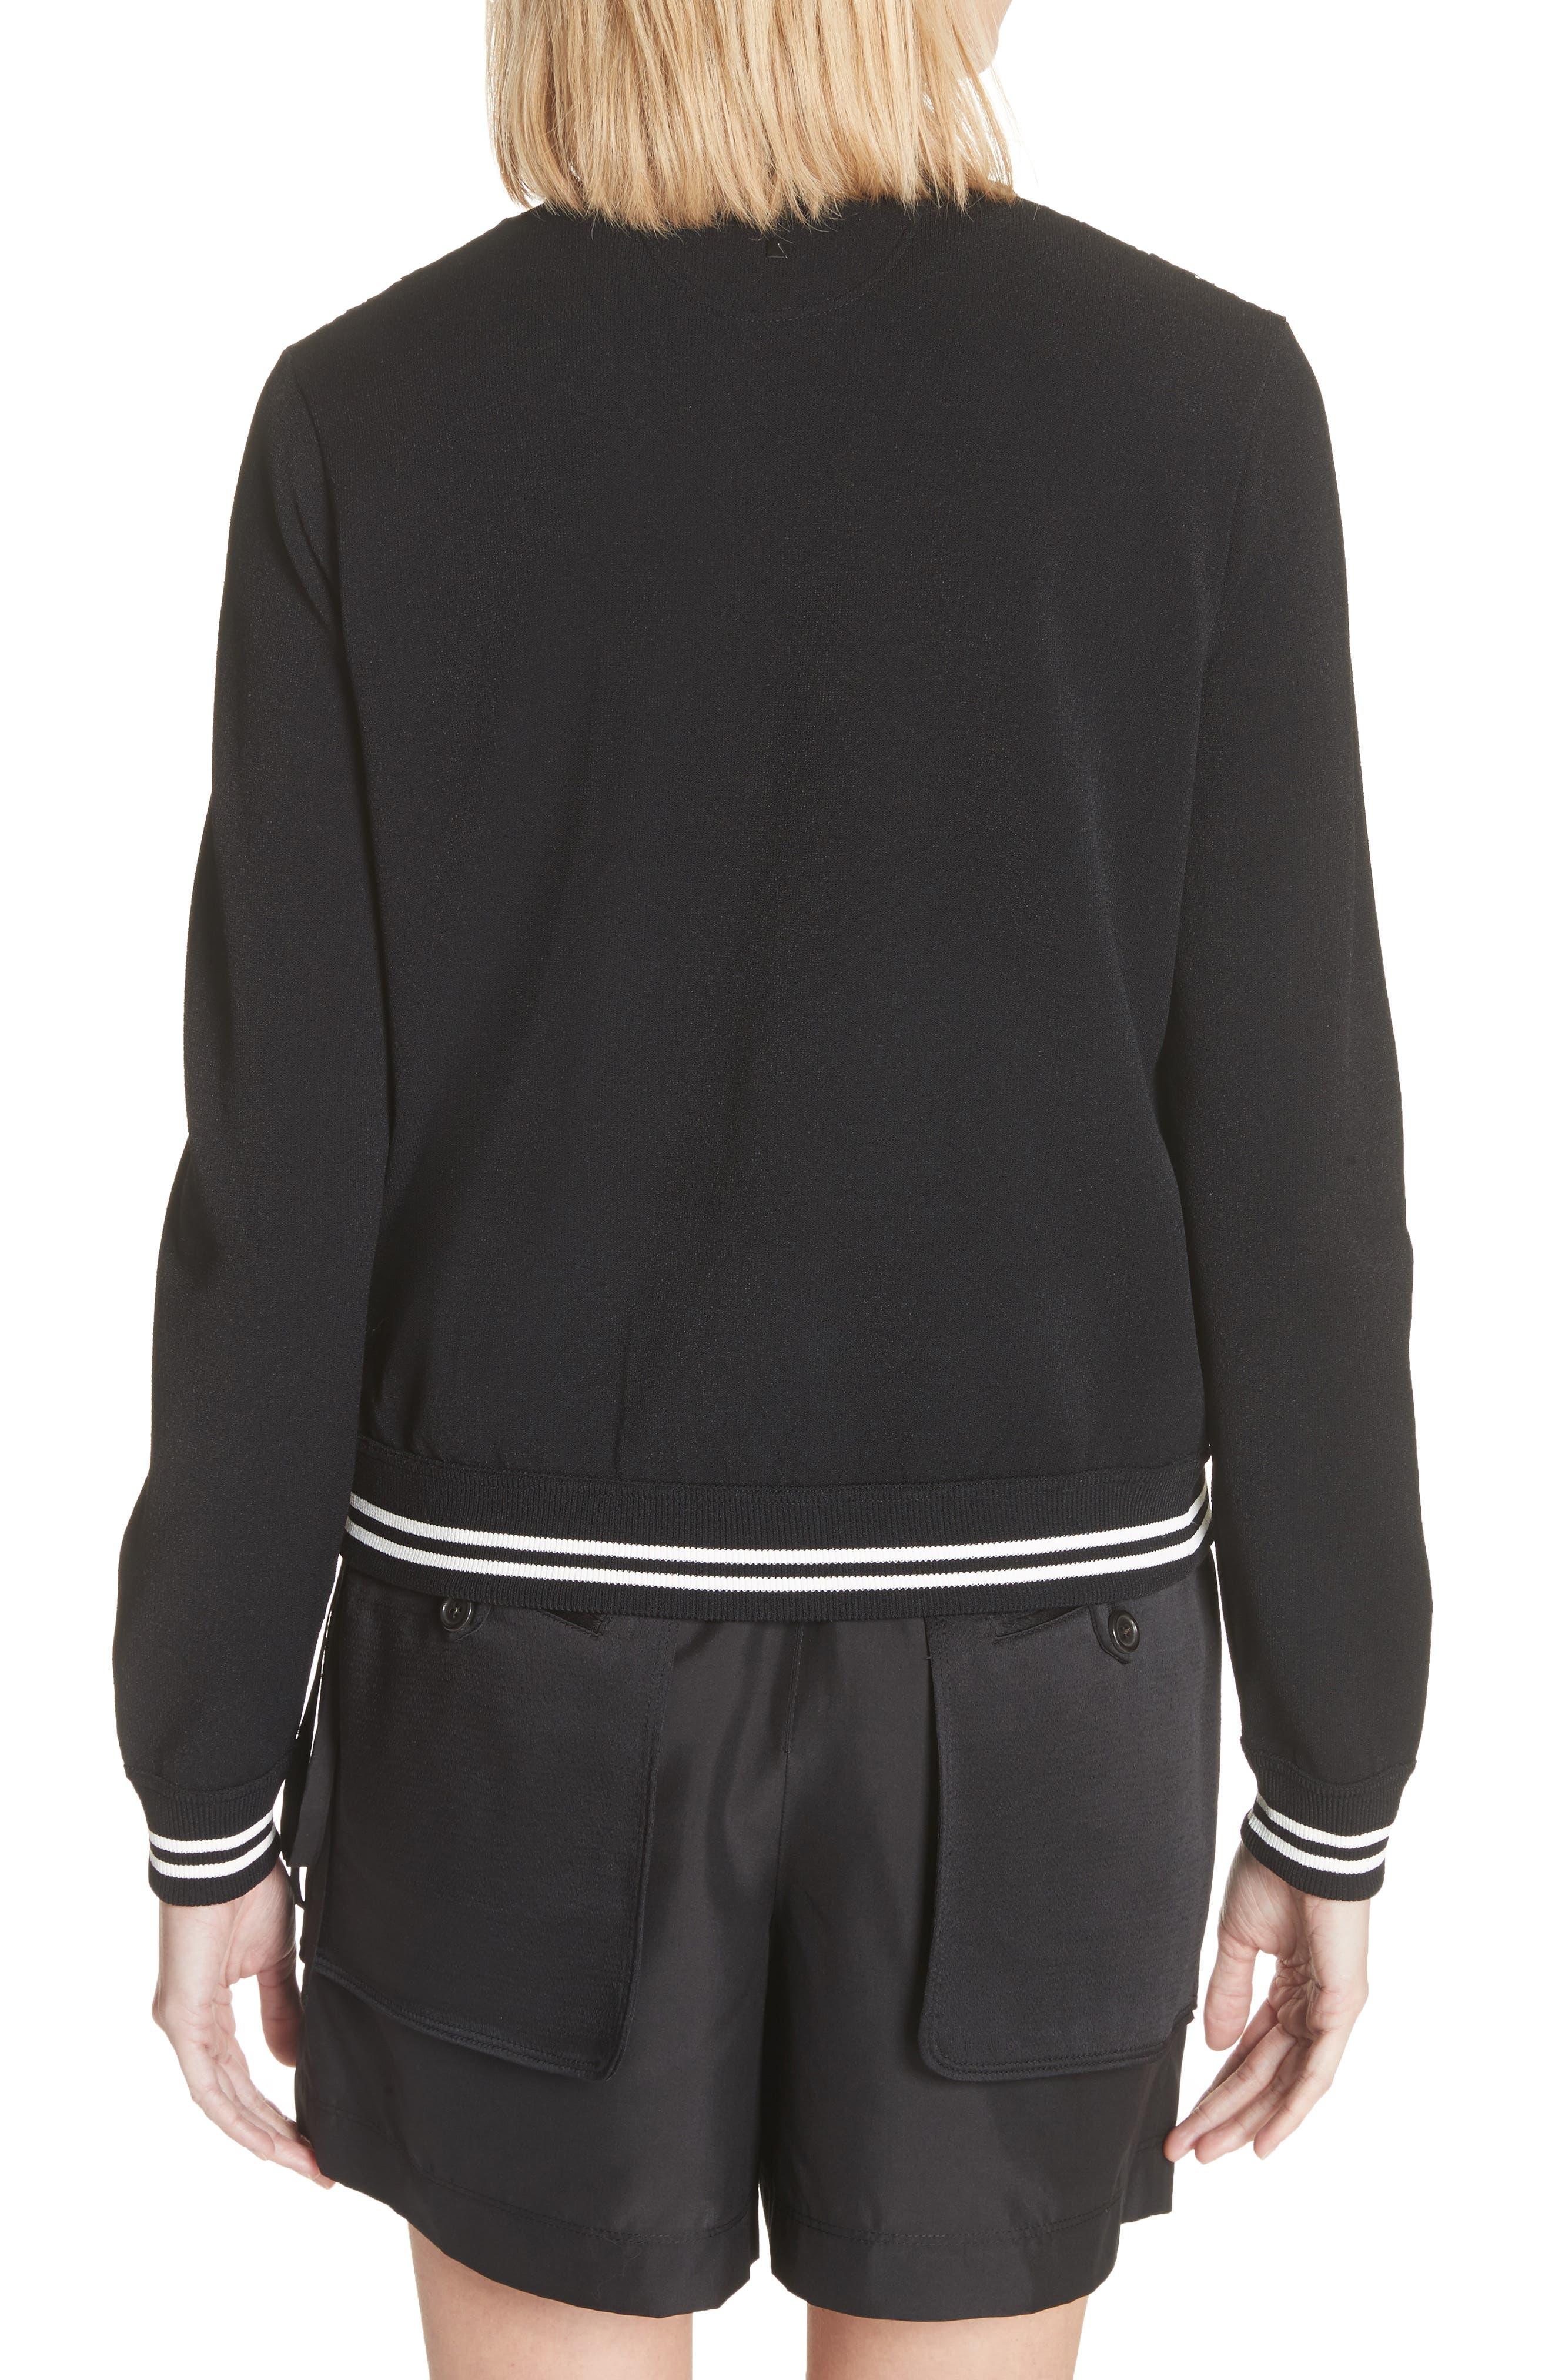 Lace Front Bomber Jacket,                             Alternate thumbnail 2, color,                             Black